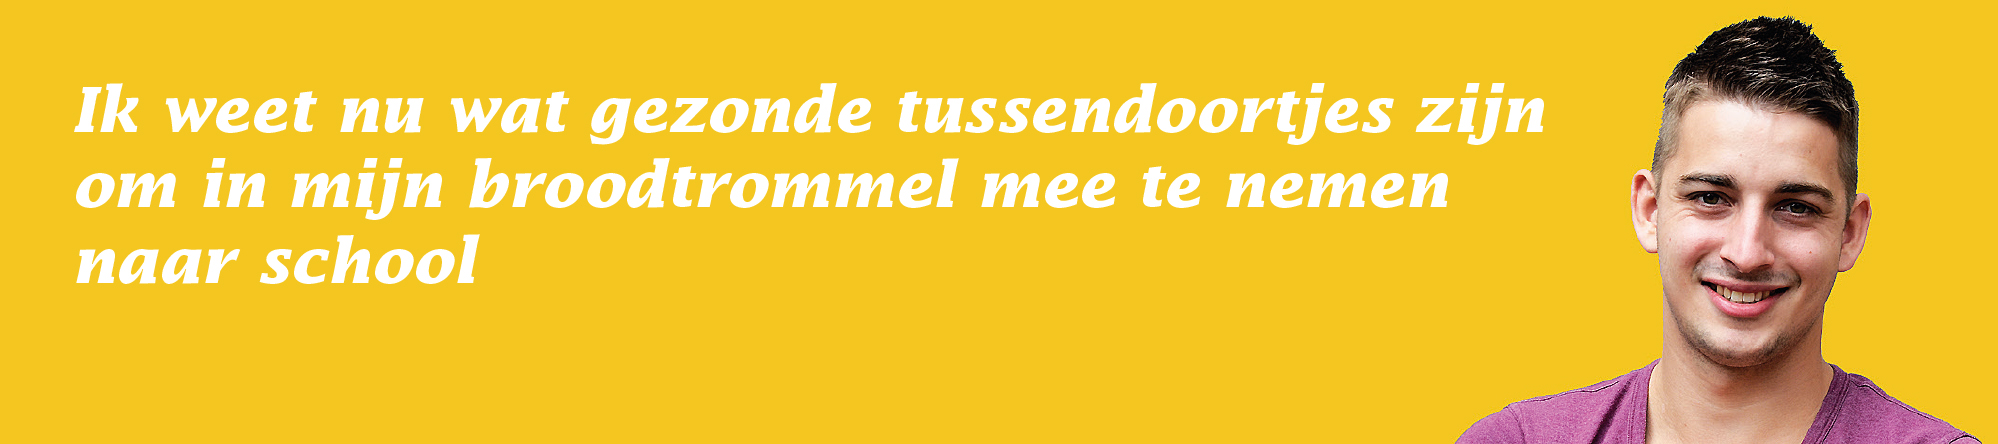 https://de-dietist.nl/wp-content/uploads/2016/09/de-dietist-quote-mathijs.jpg